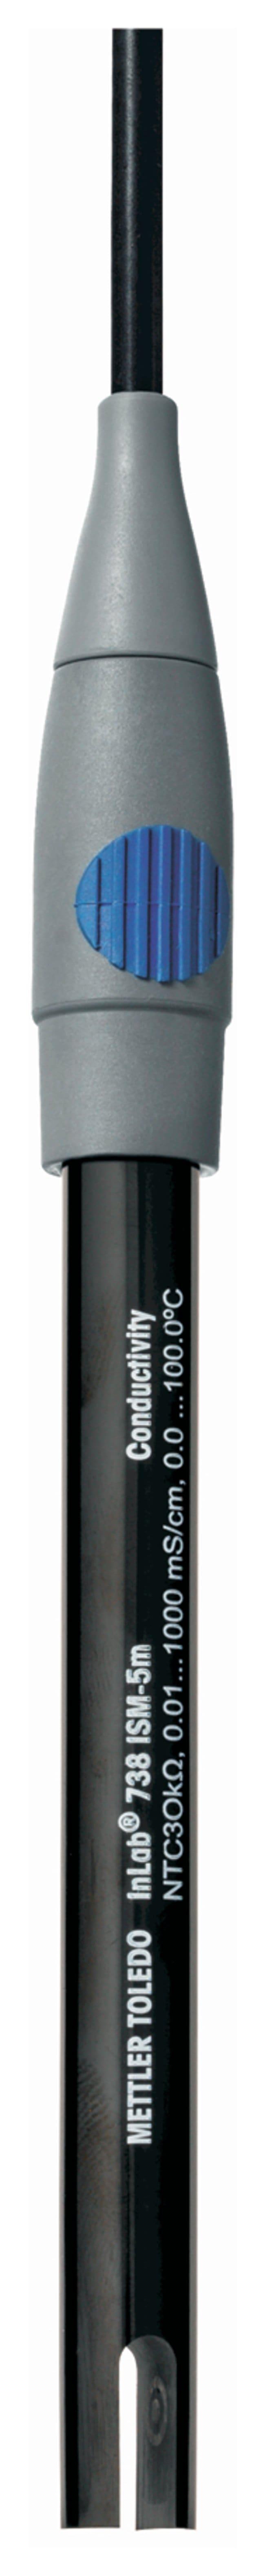 Mettler Toledo™InLab™ Conductivity Sensors